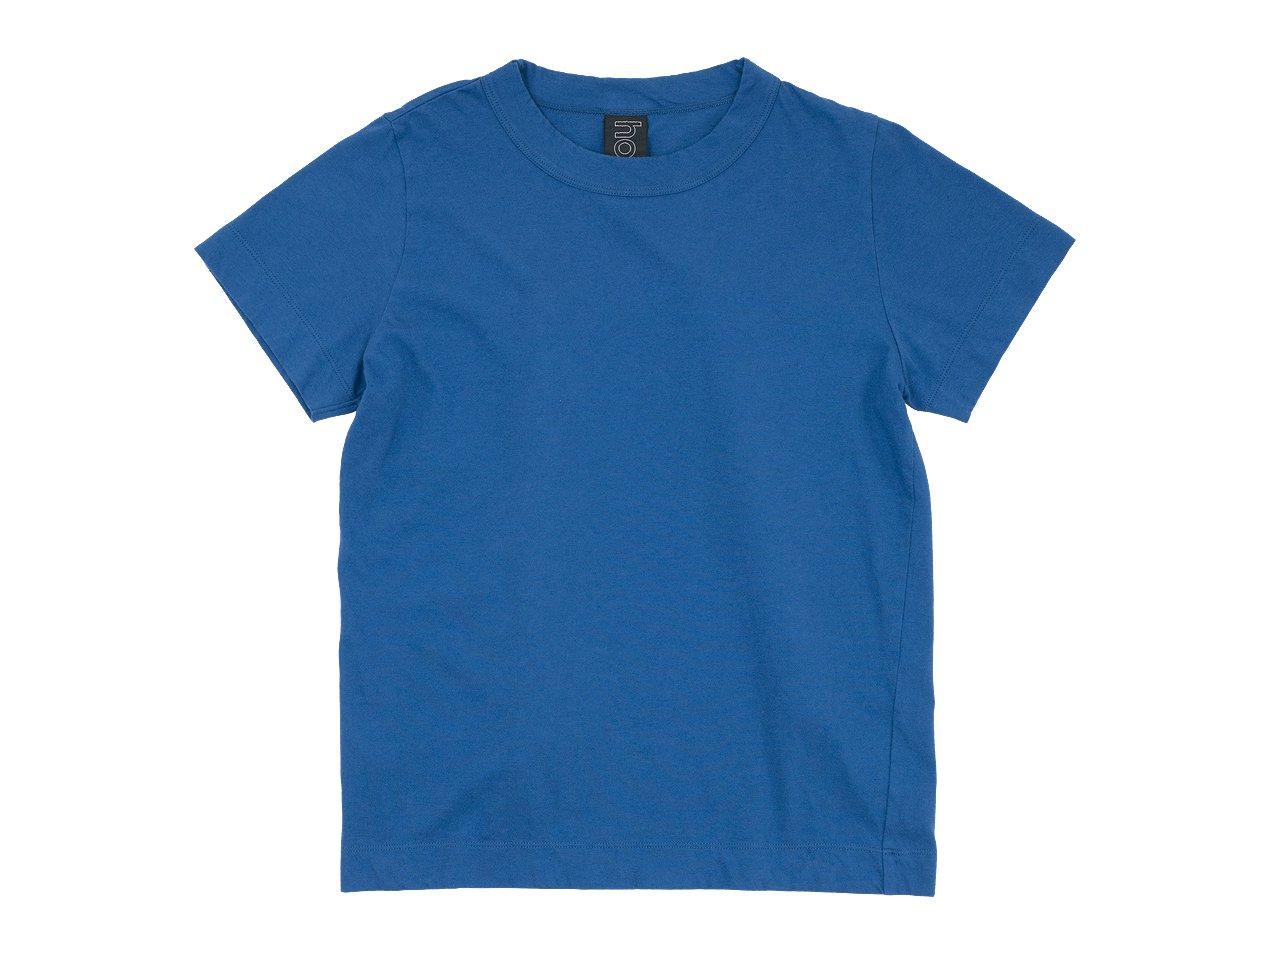 homspun 30/1天竺半袖Tシャツ ブルー